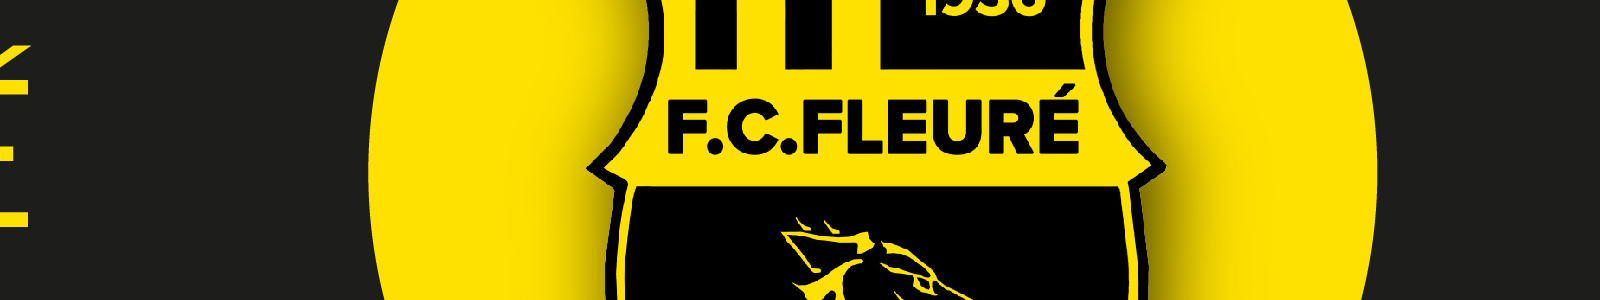 Site Internet officiel du club de football FOOTBALL CLUB FLEURÉ